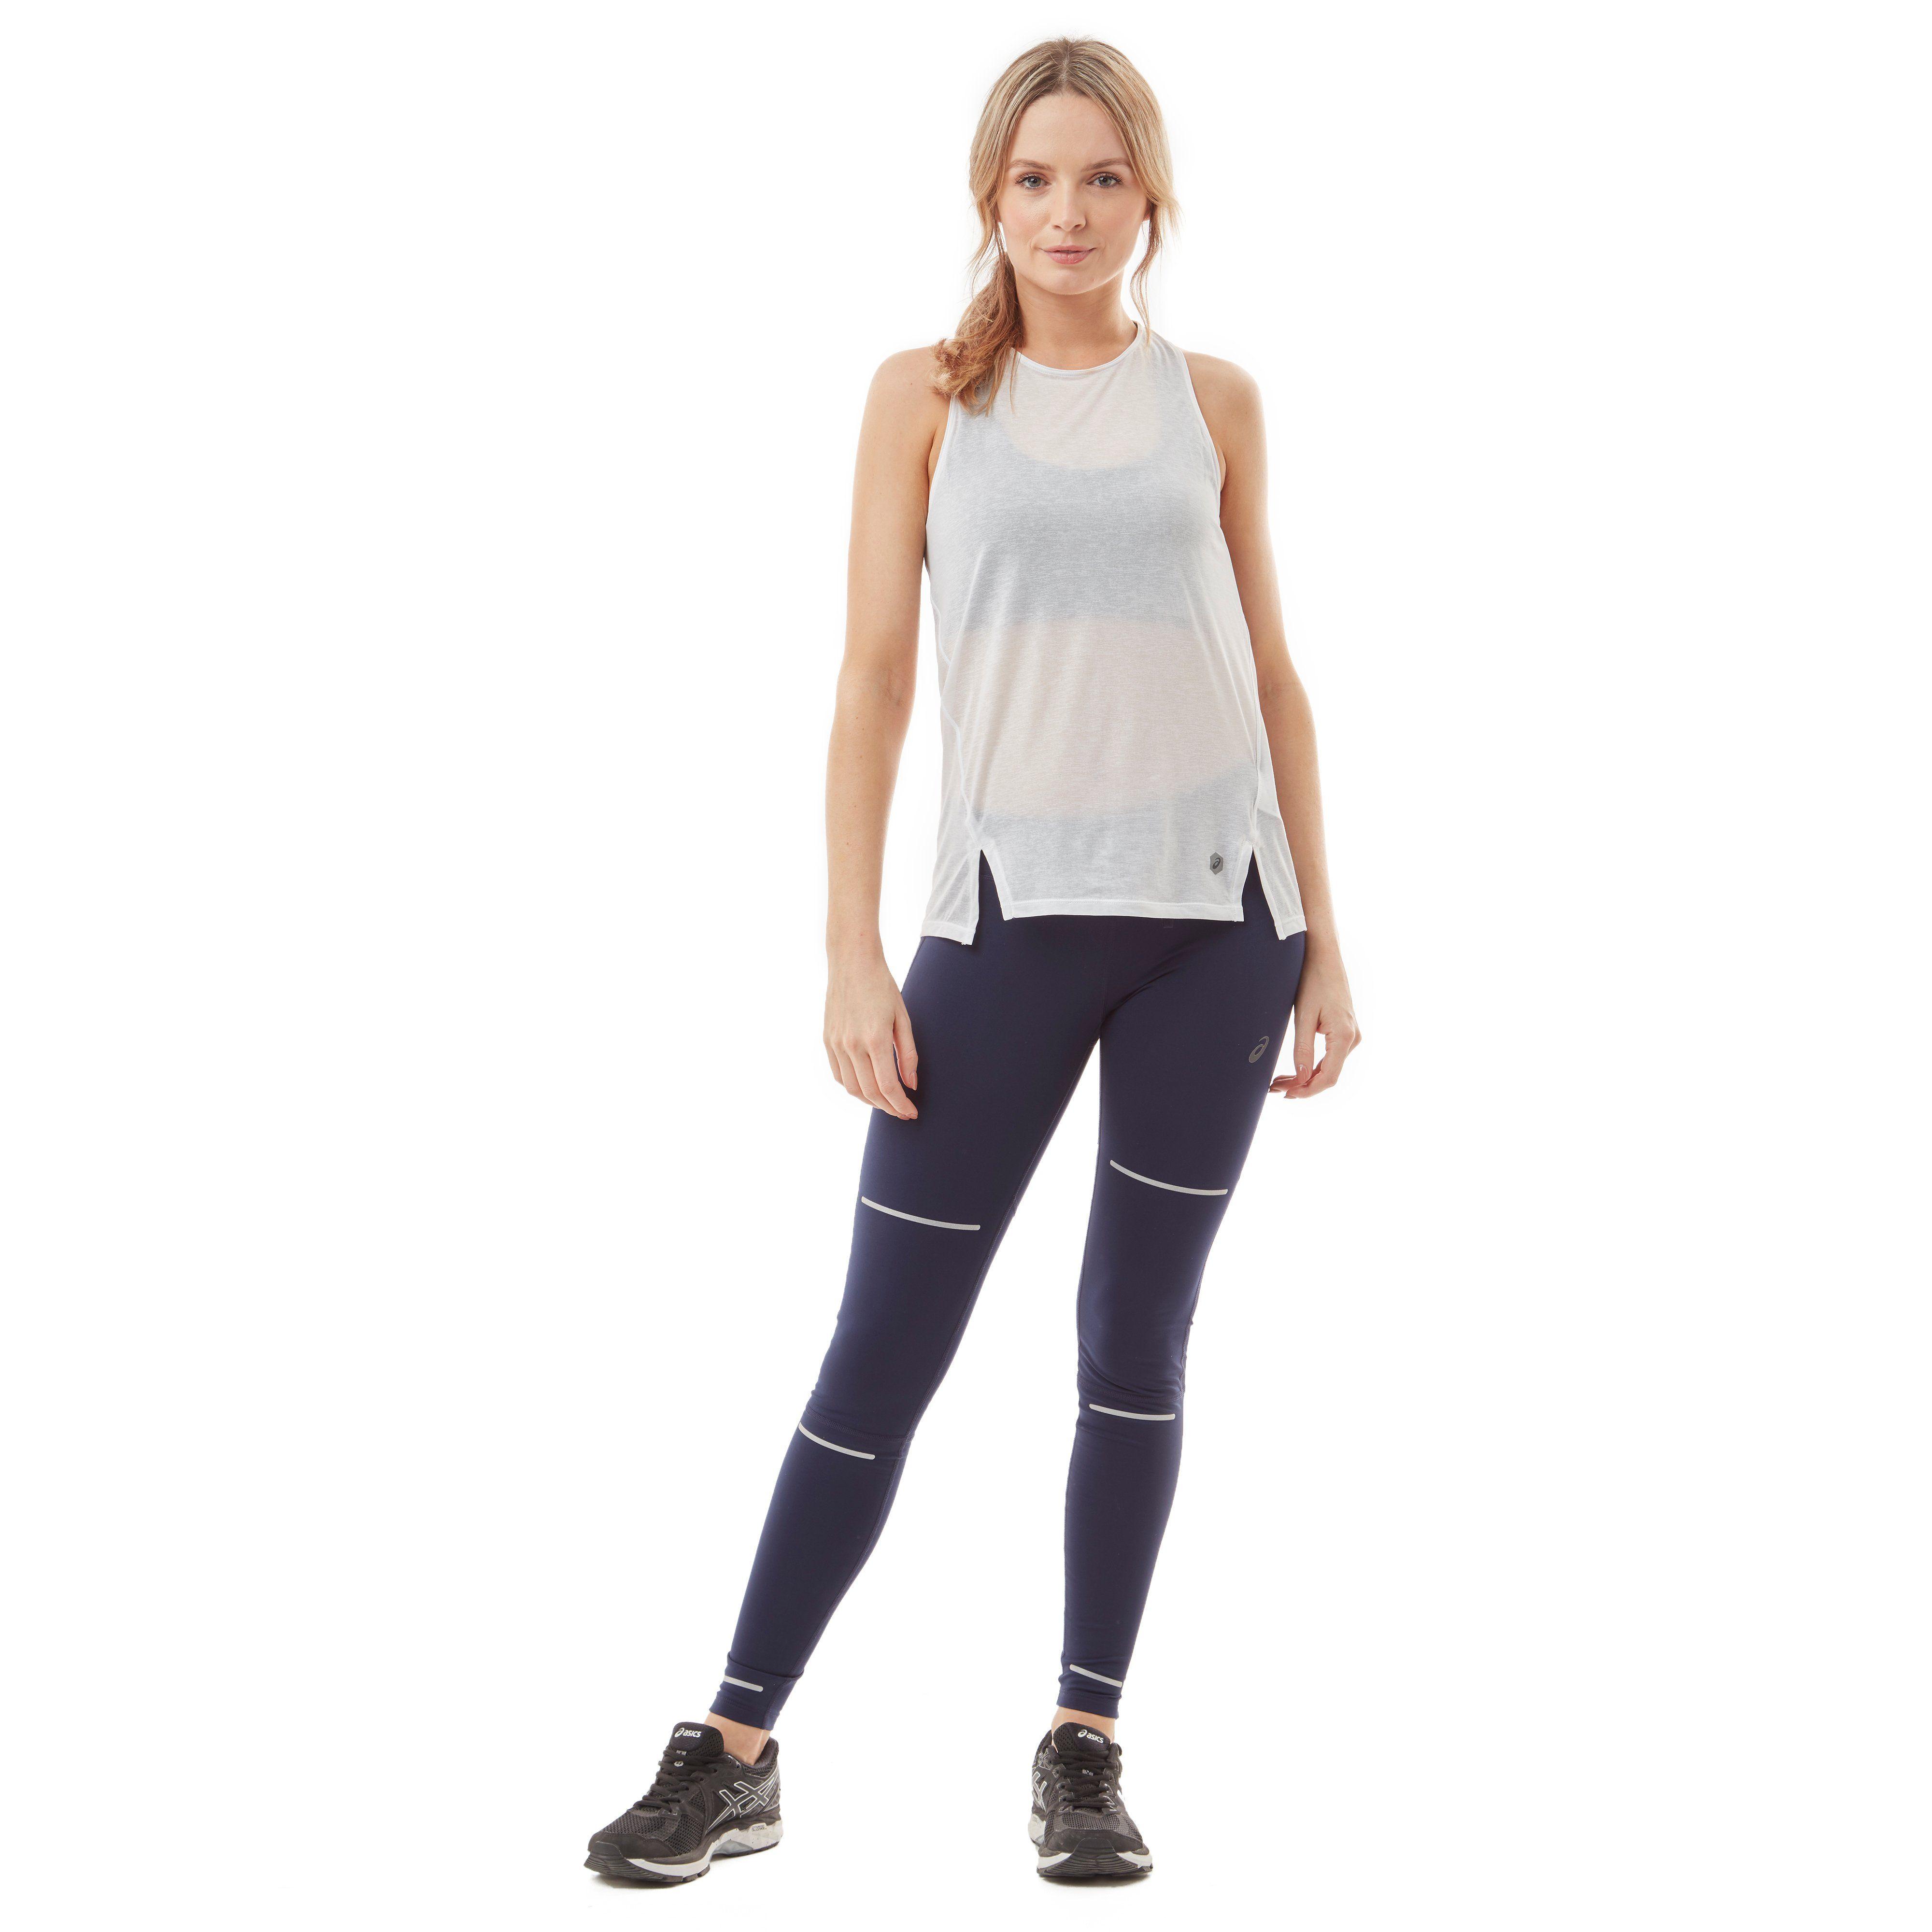 ASICS Lite-Show Women's Running Tights